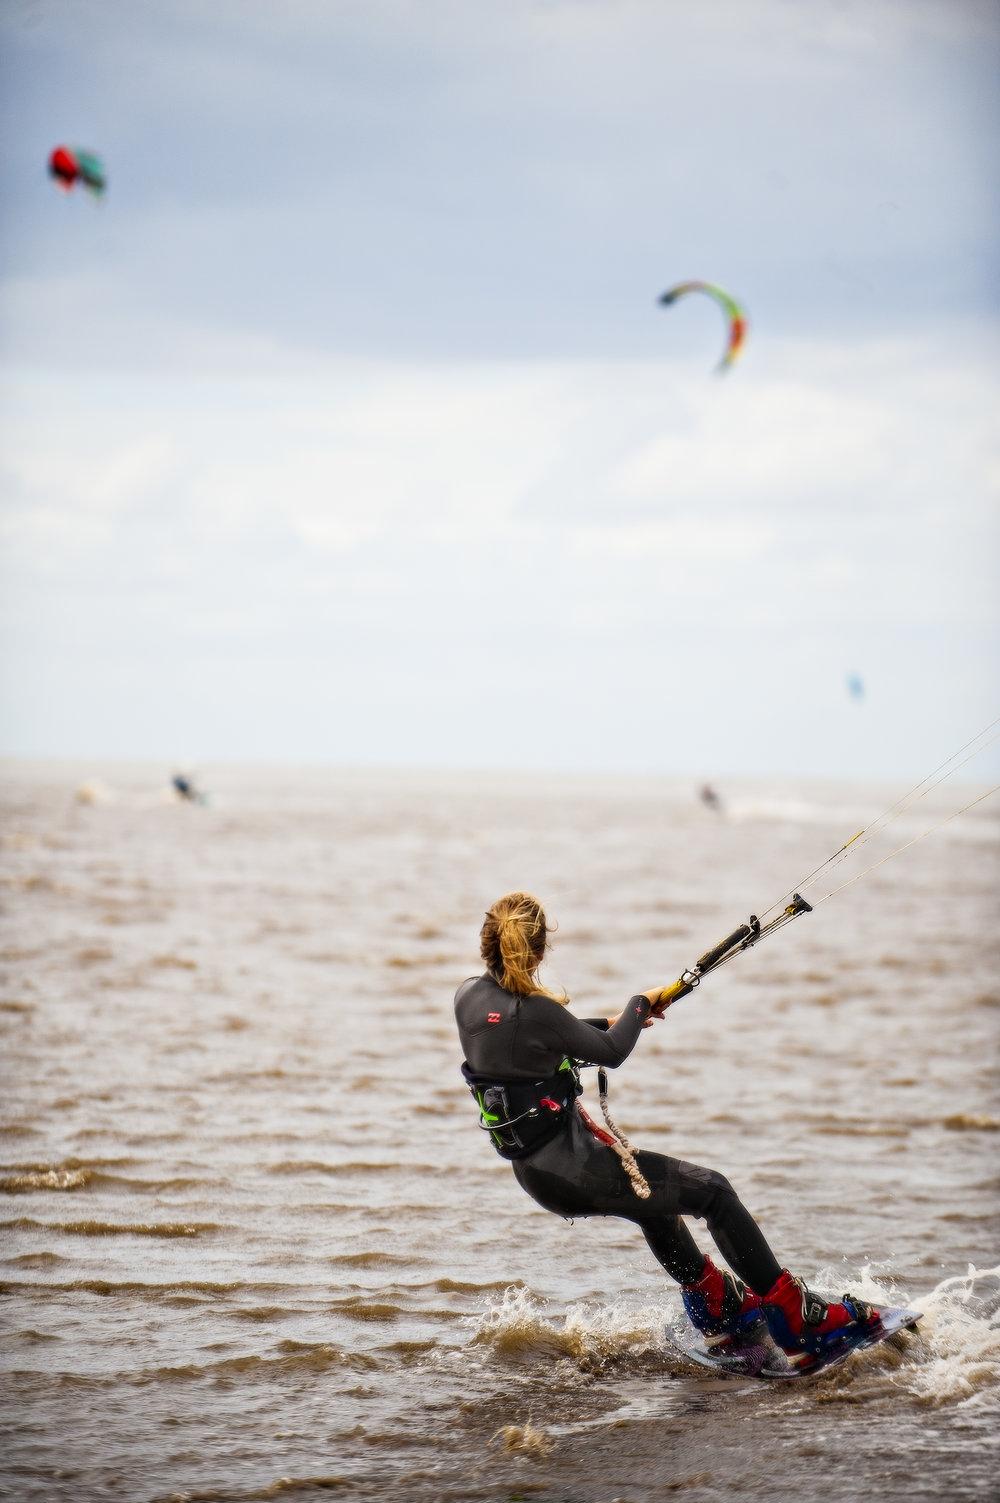 Kitesurfing in Hunstanton-44.JPG